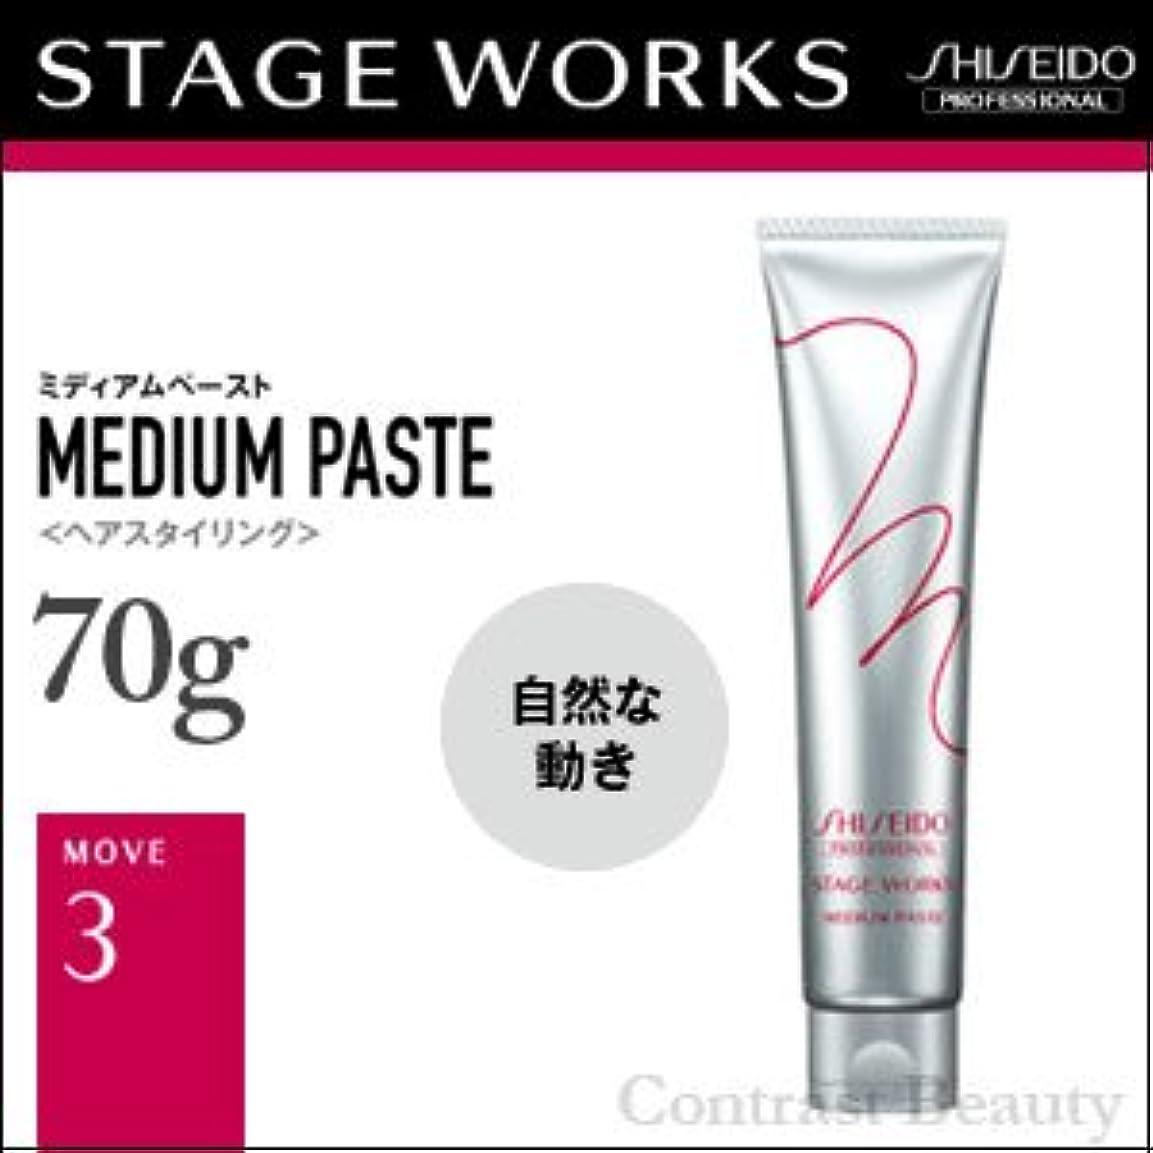 【x4個セット】 資生堂 ステージワークス ムーブ3 ミディアムペースト 70g